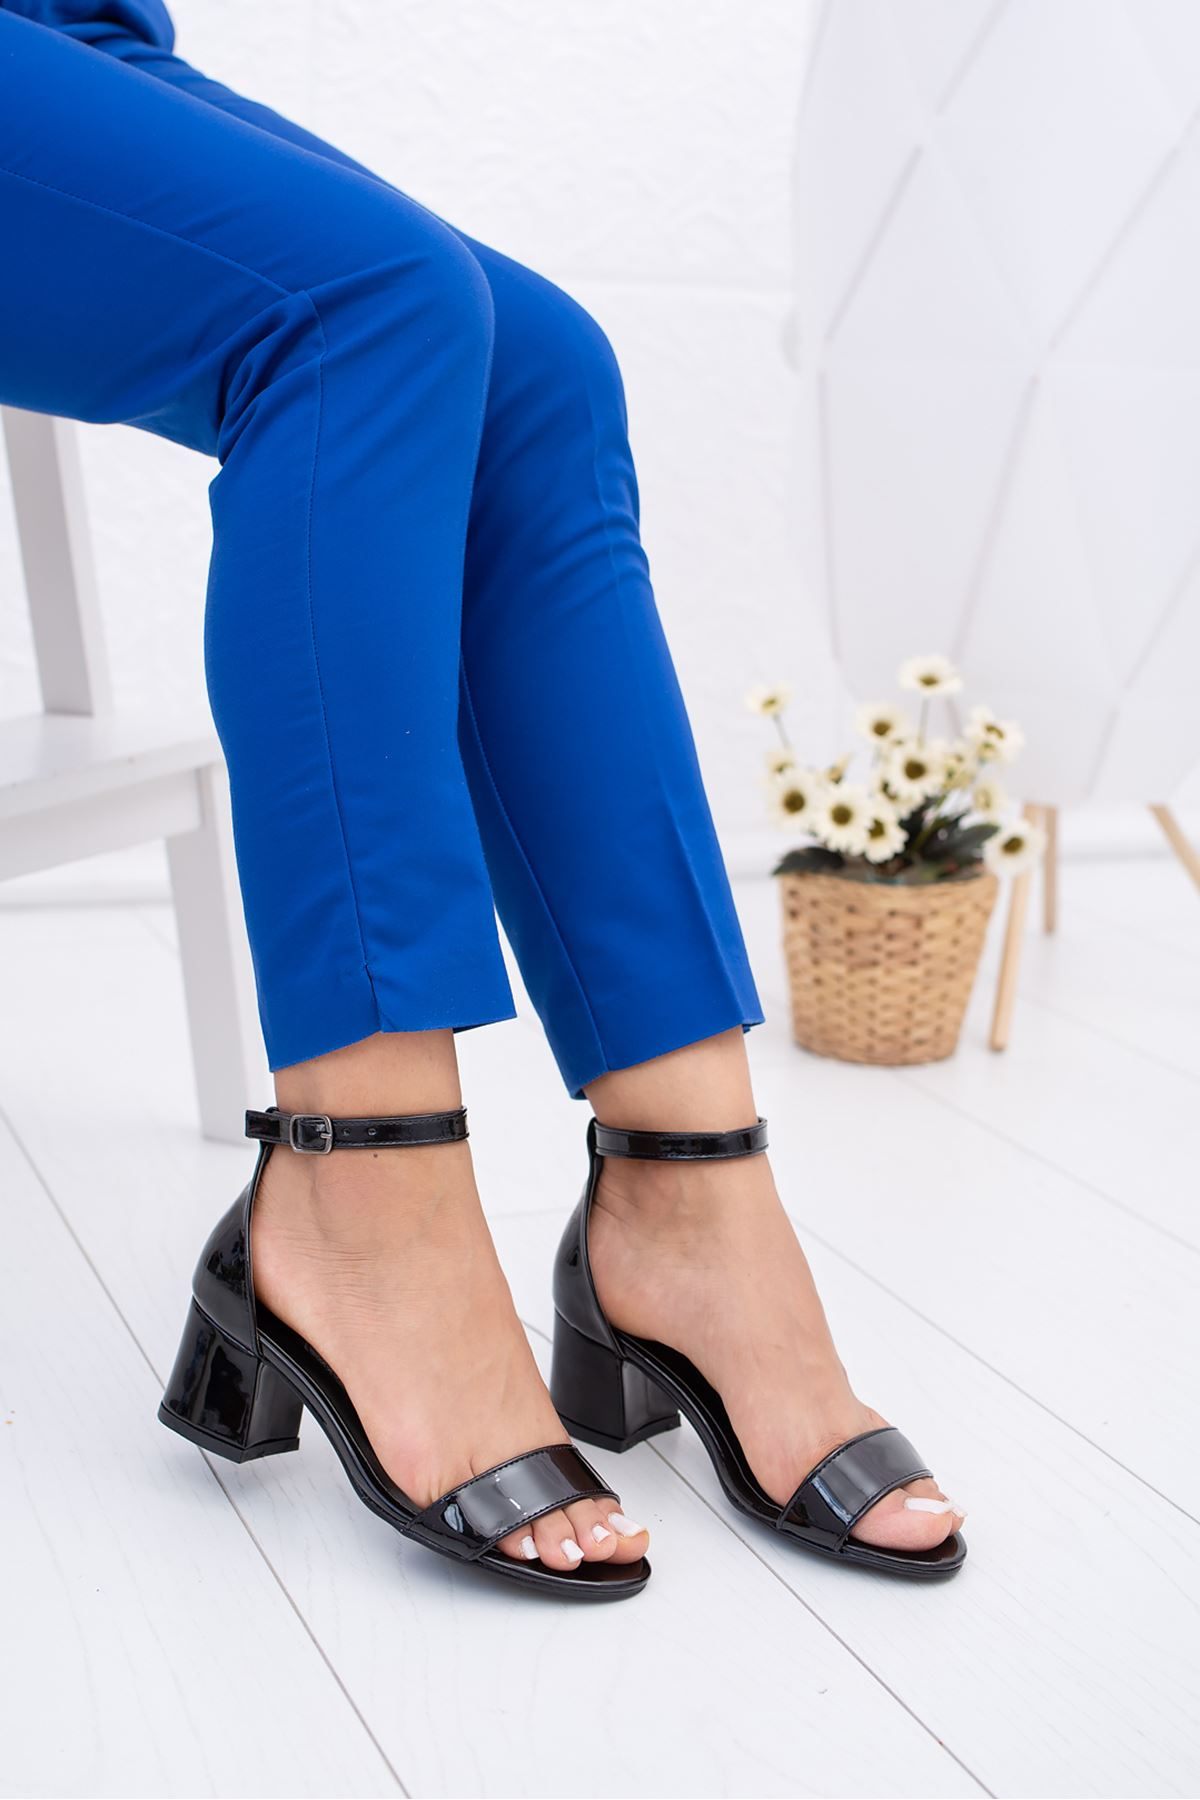 Kısa Topuk Tek Bant Siyah Rugan Ayakkabı